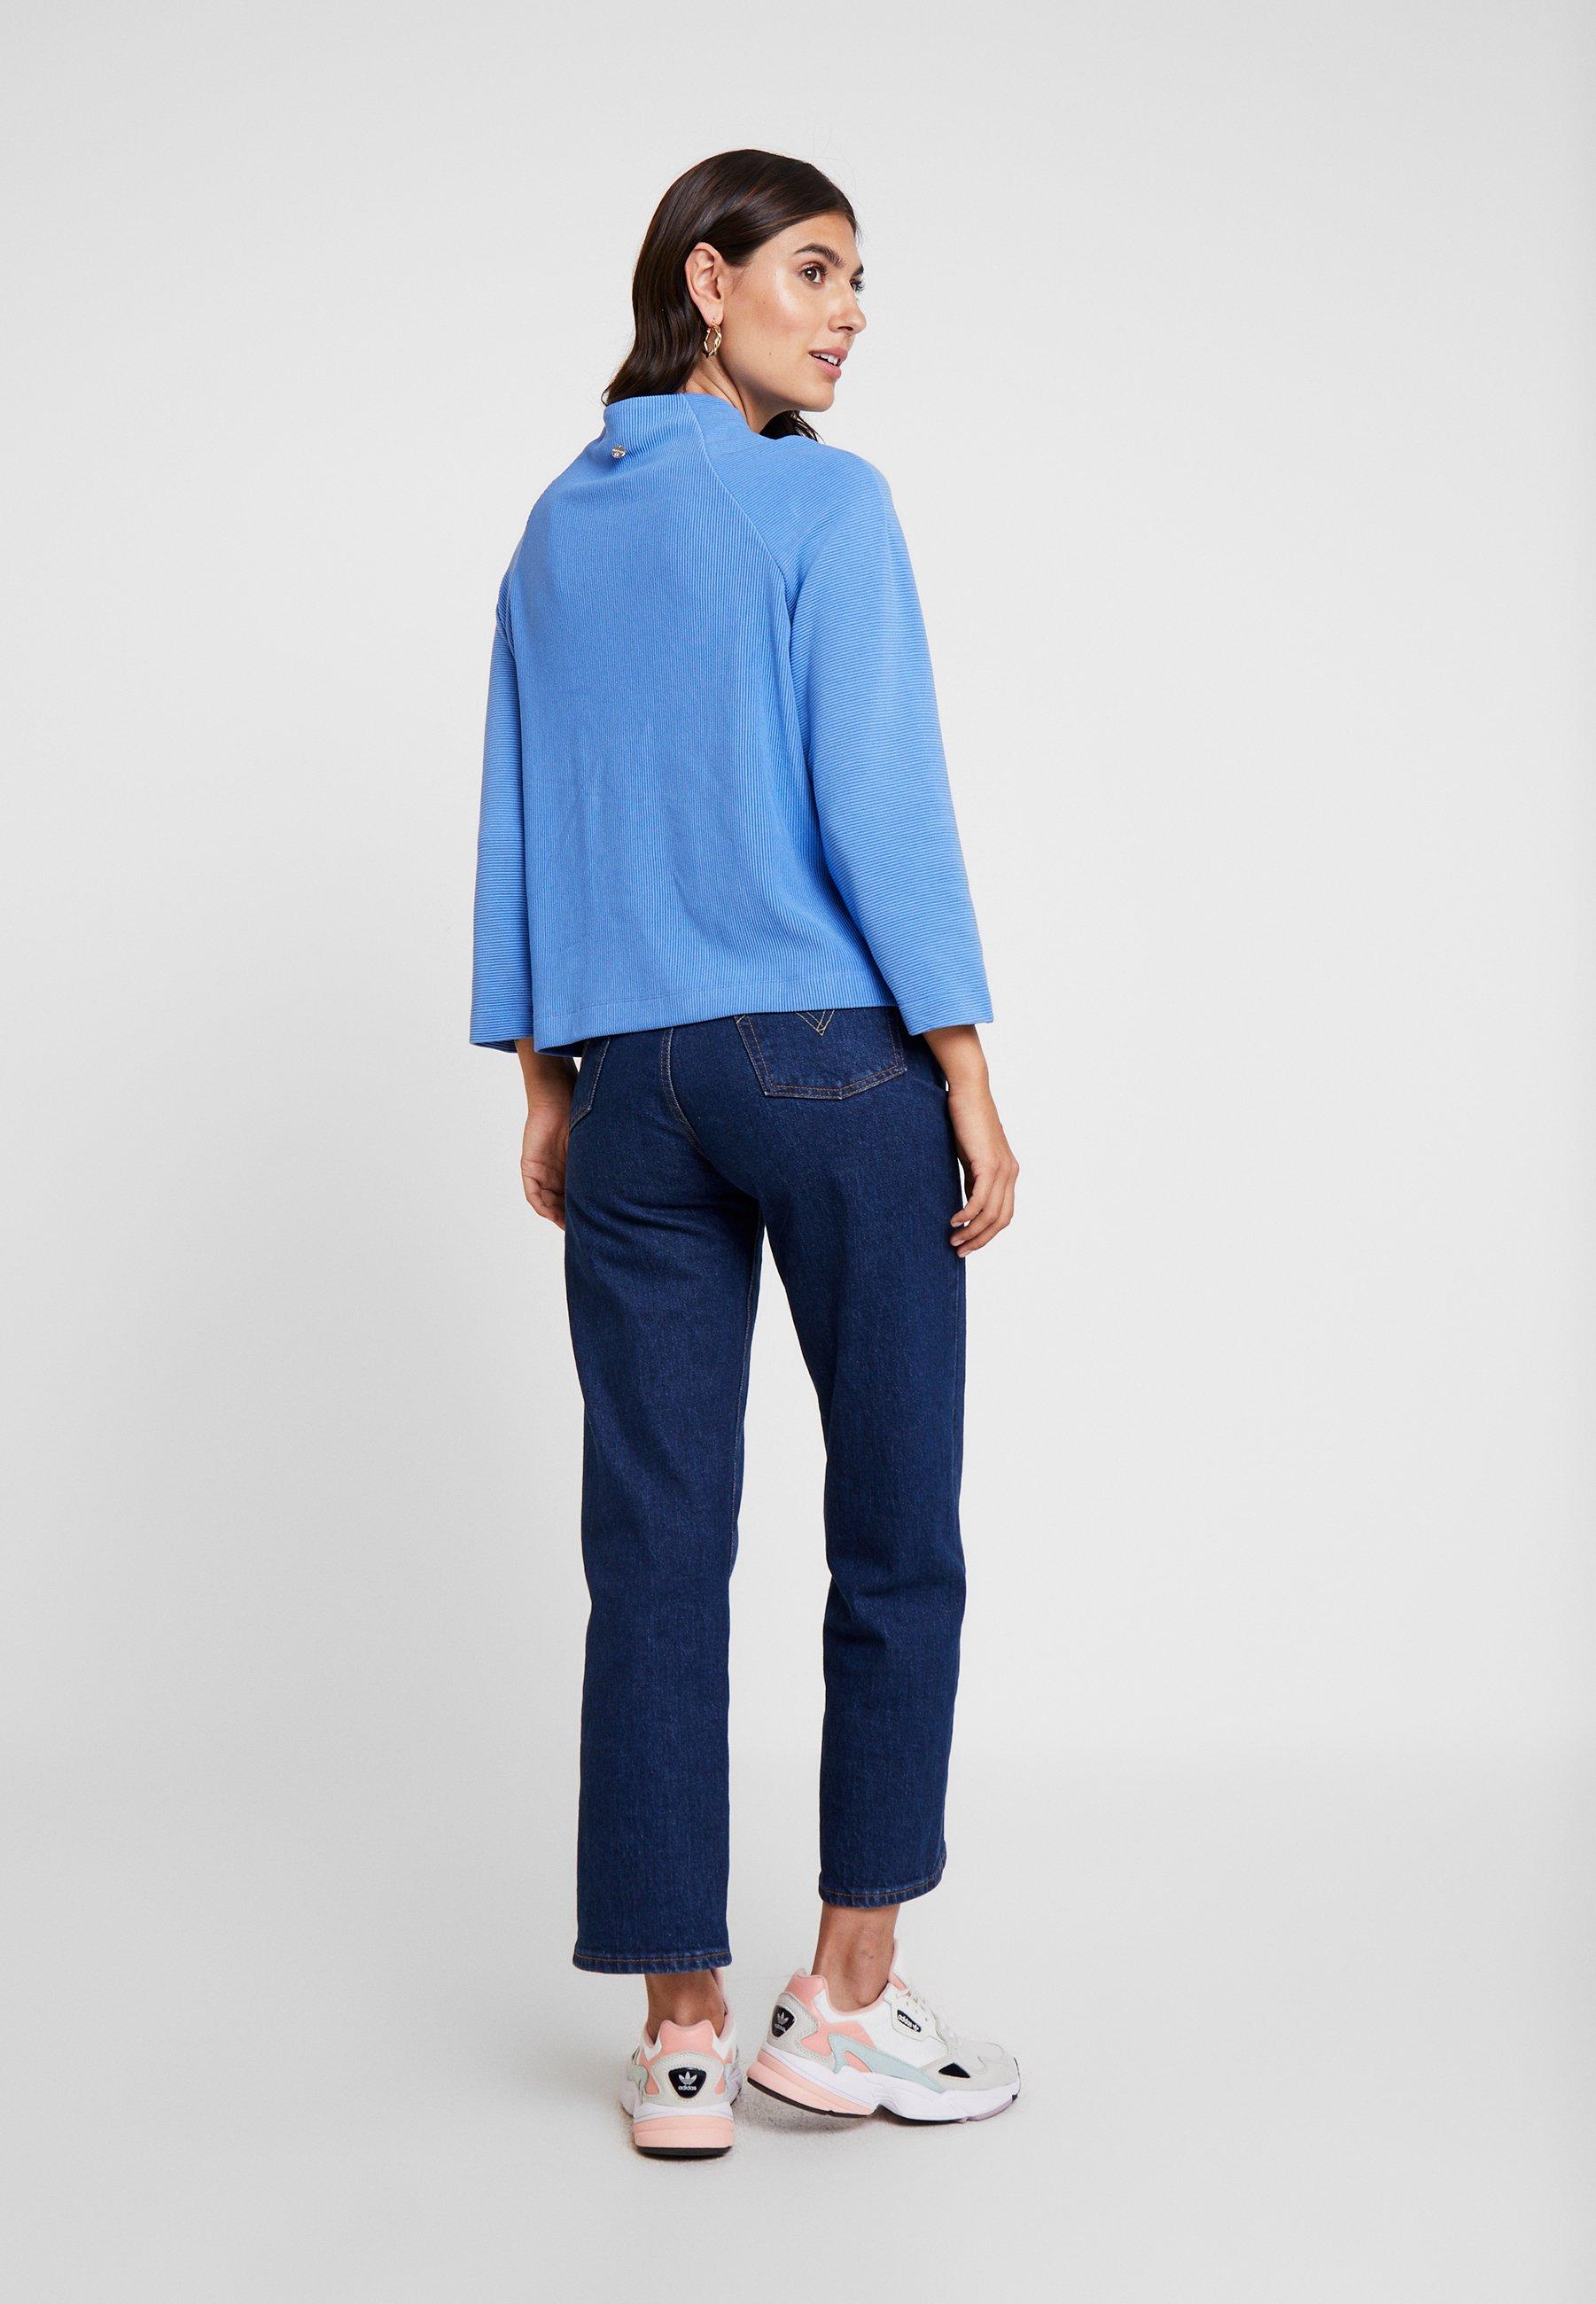 À Manches Cornflower Blue Royal Comfy shirt Richamp; Longues TurtleT 5Aj3RLS4cq